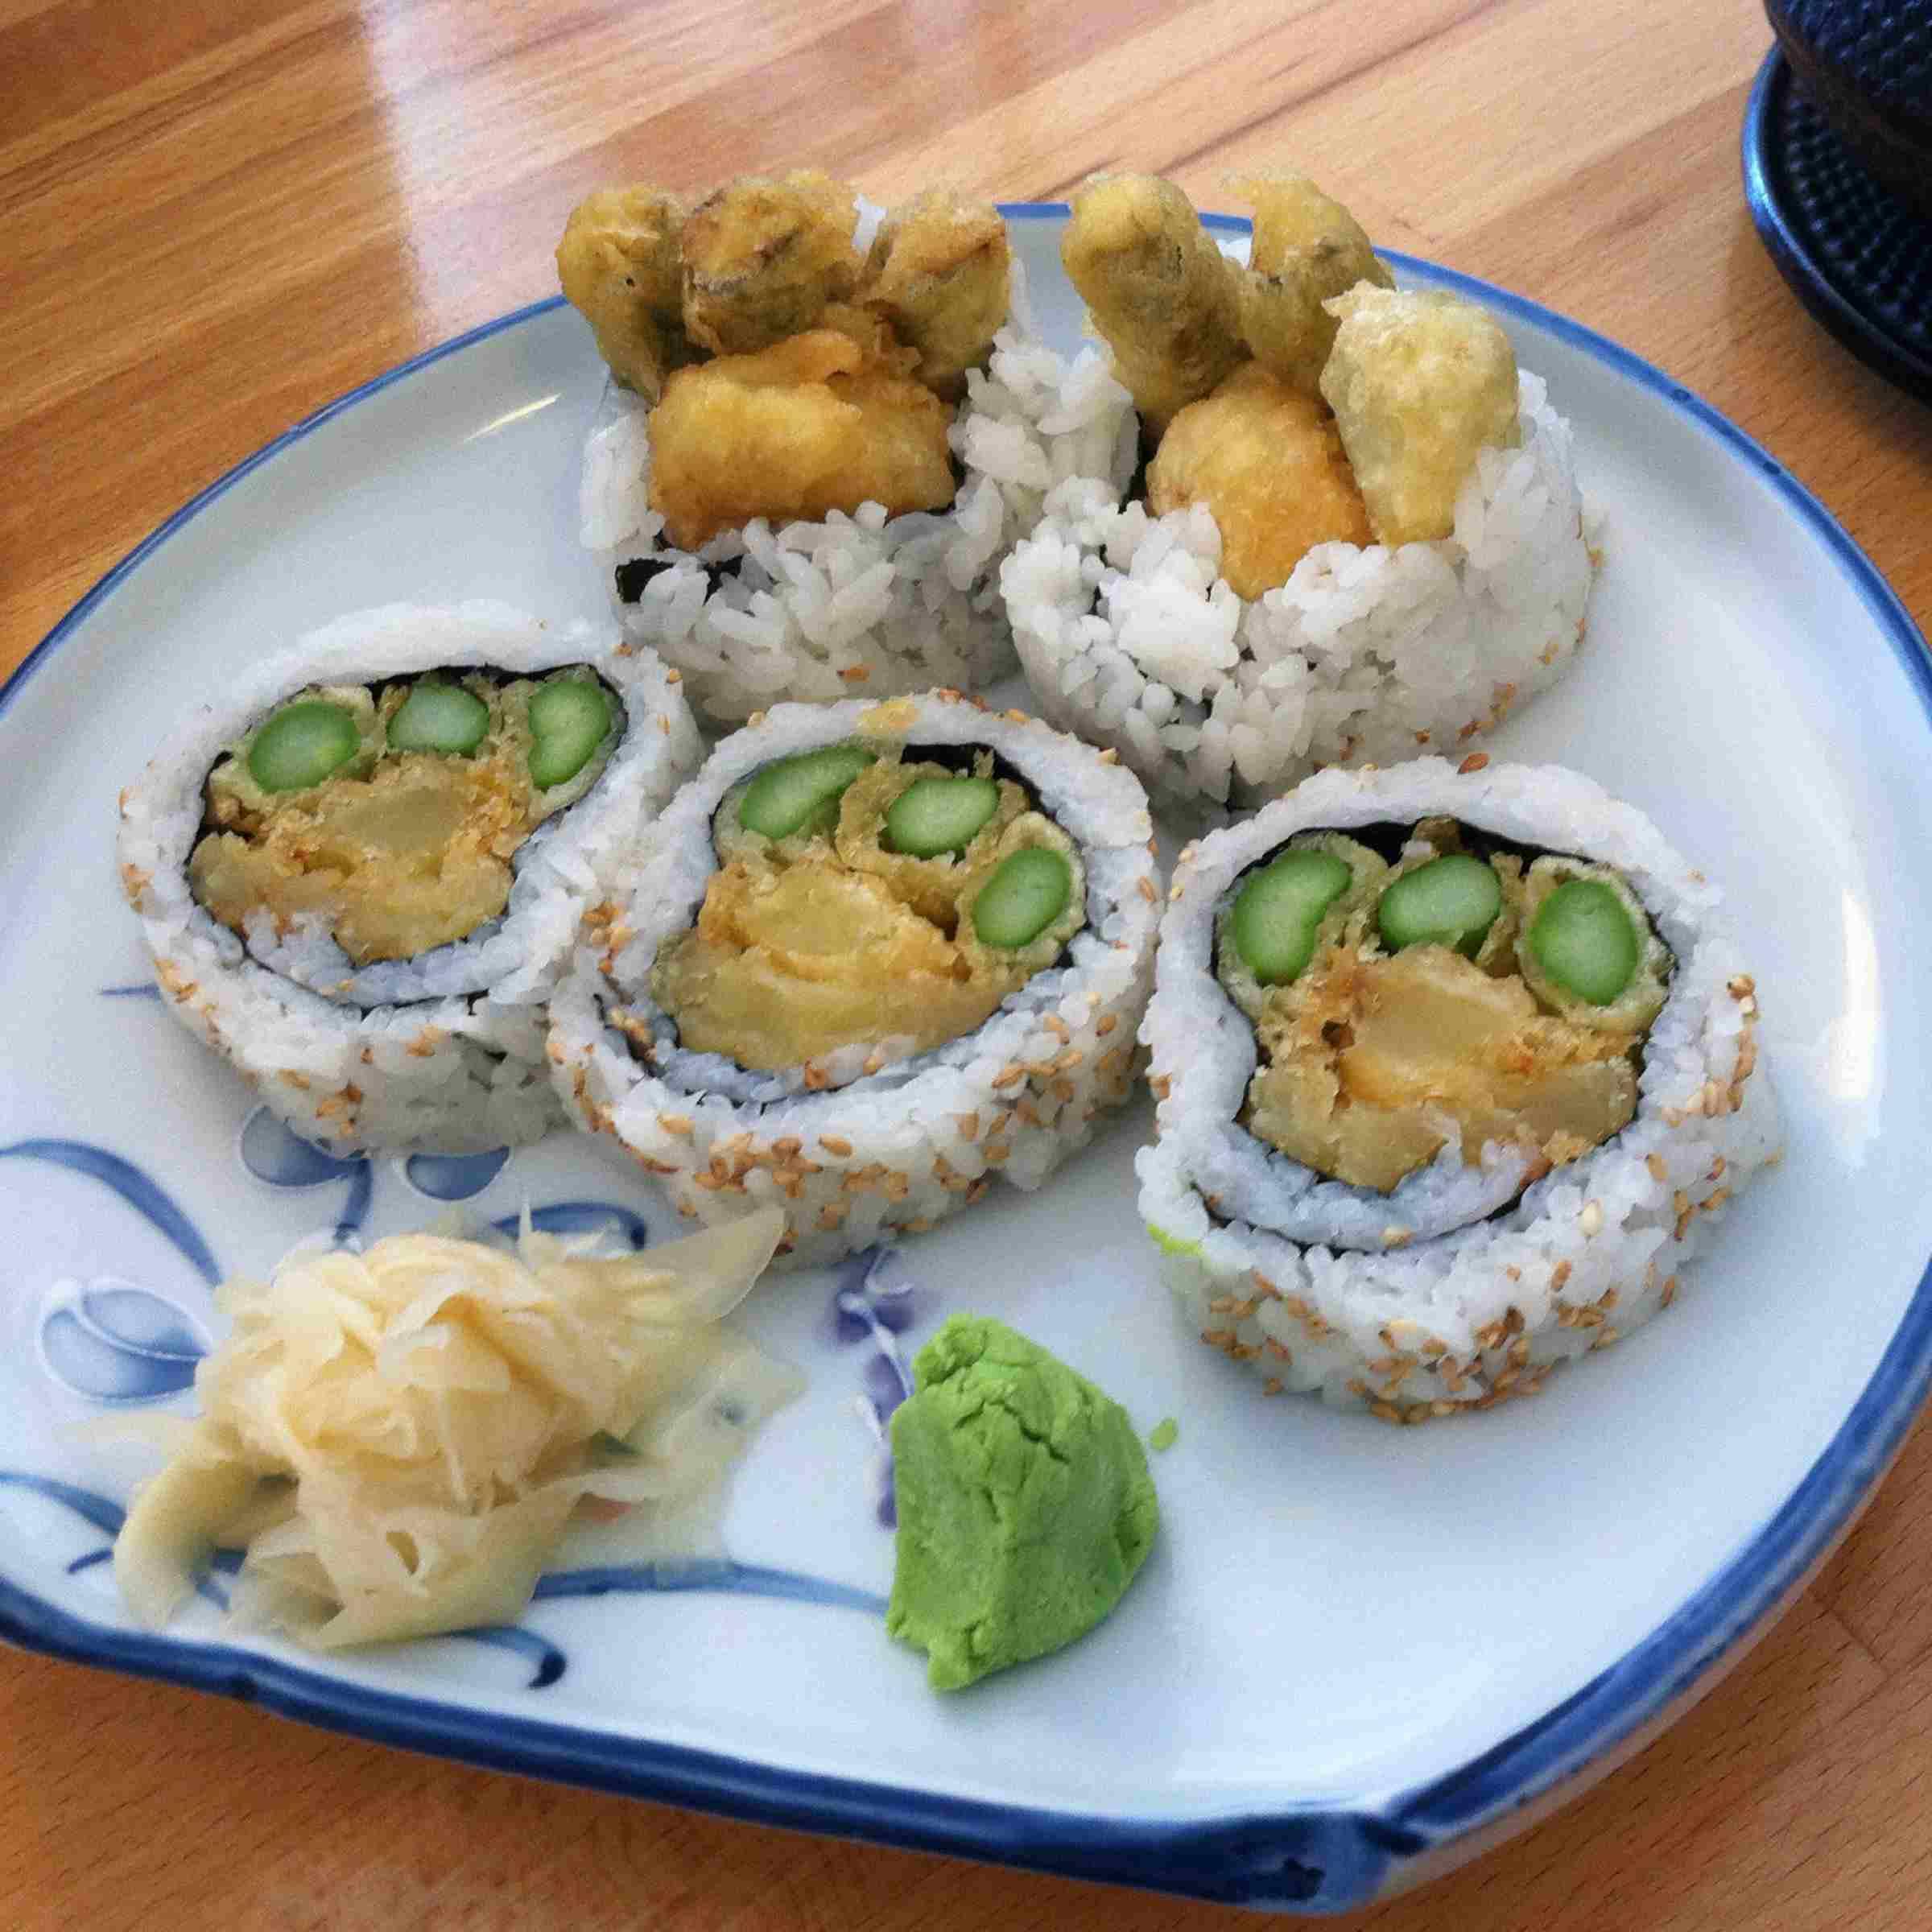 Shattuck Roll @ Cha-Ya Vegetarian Japanese Restaurant